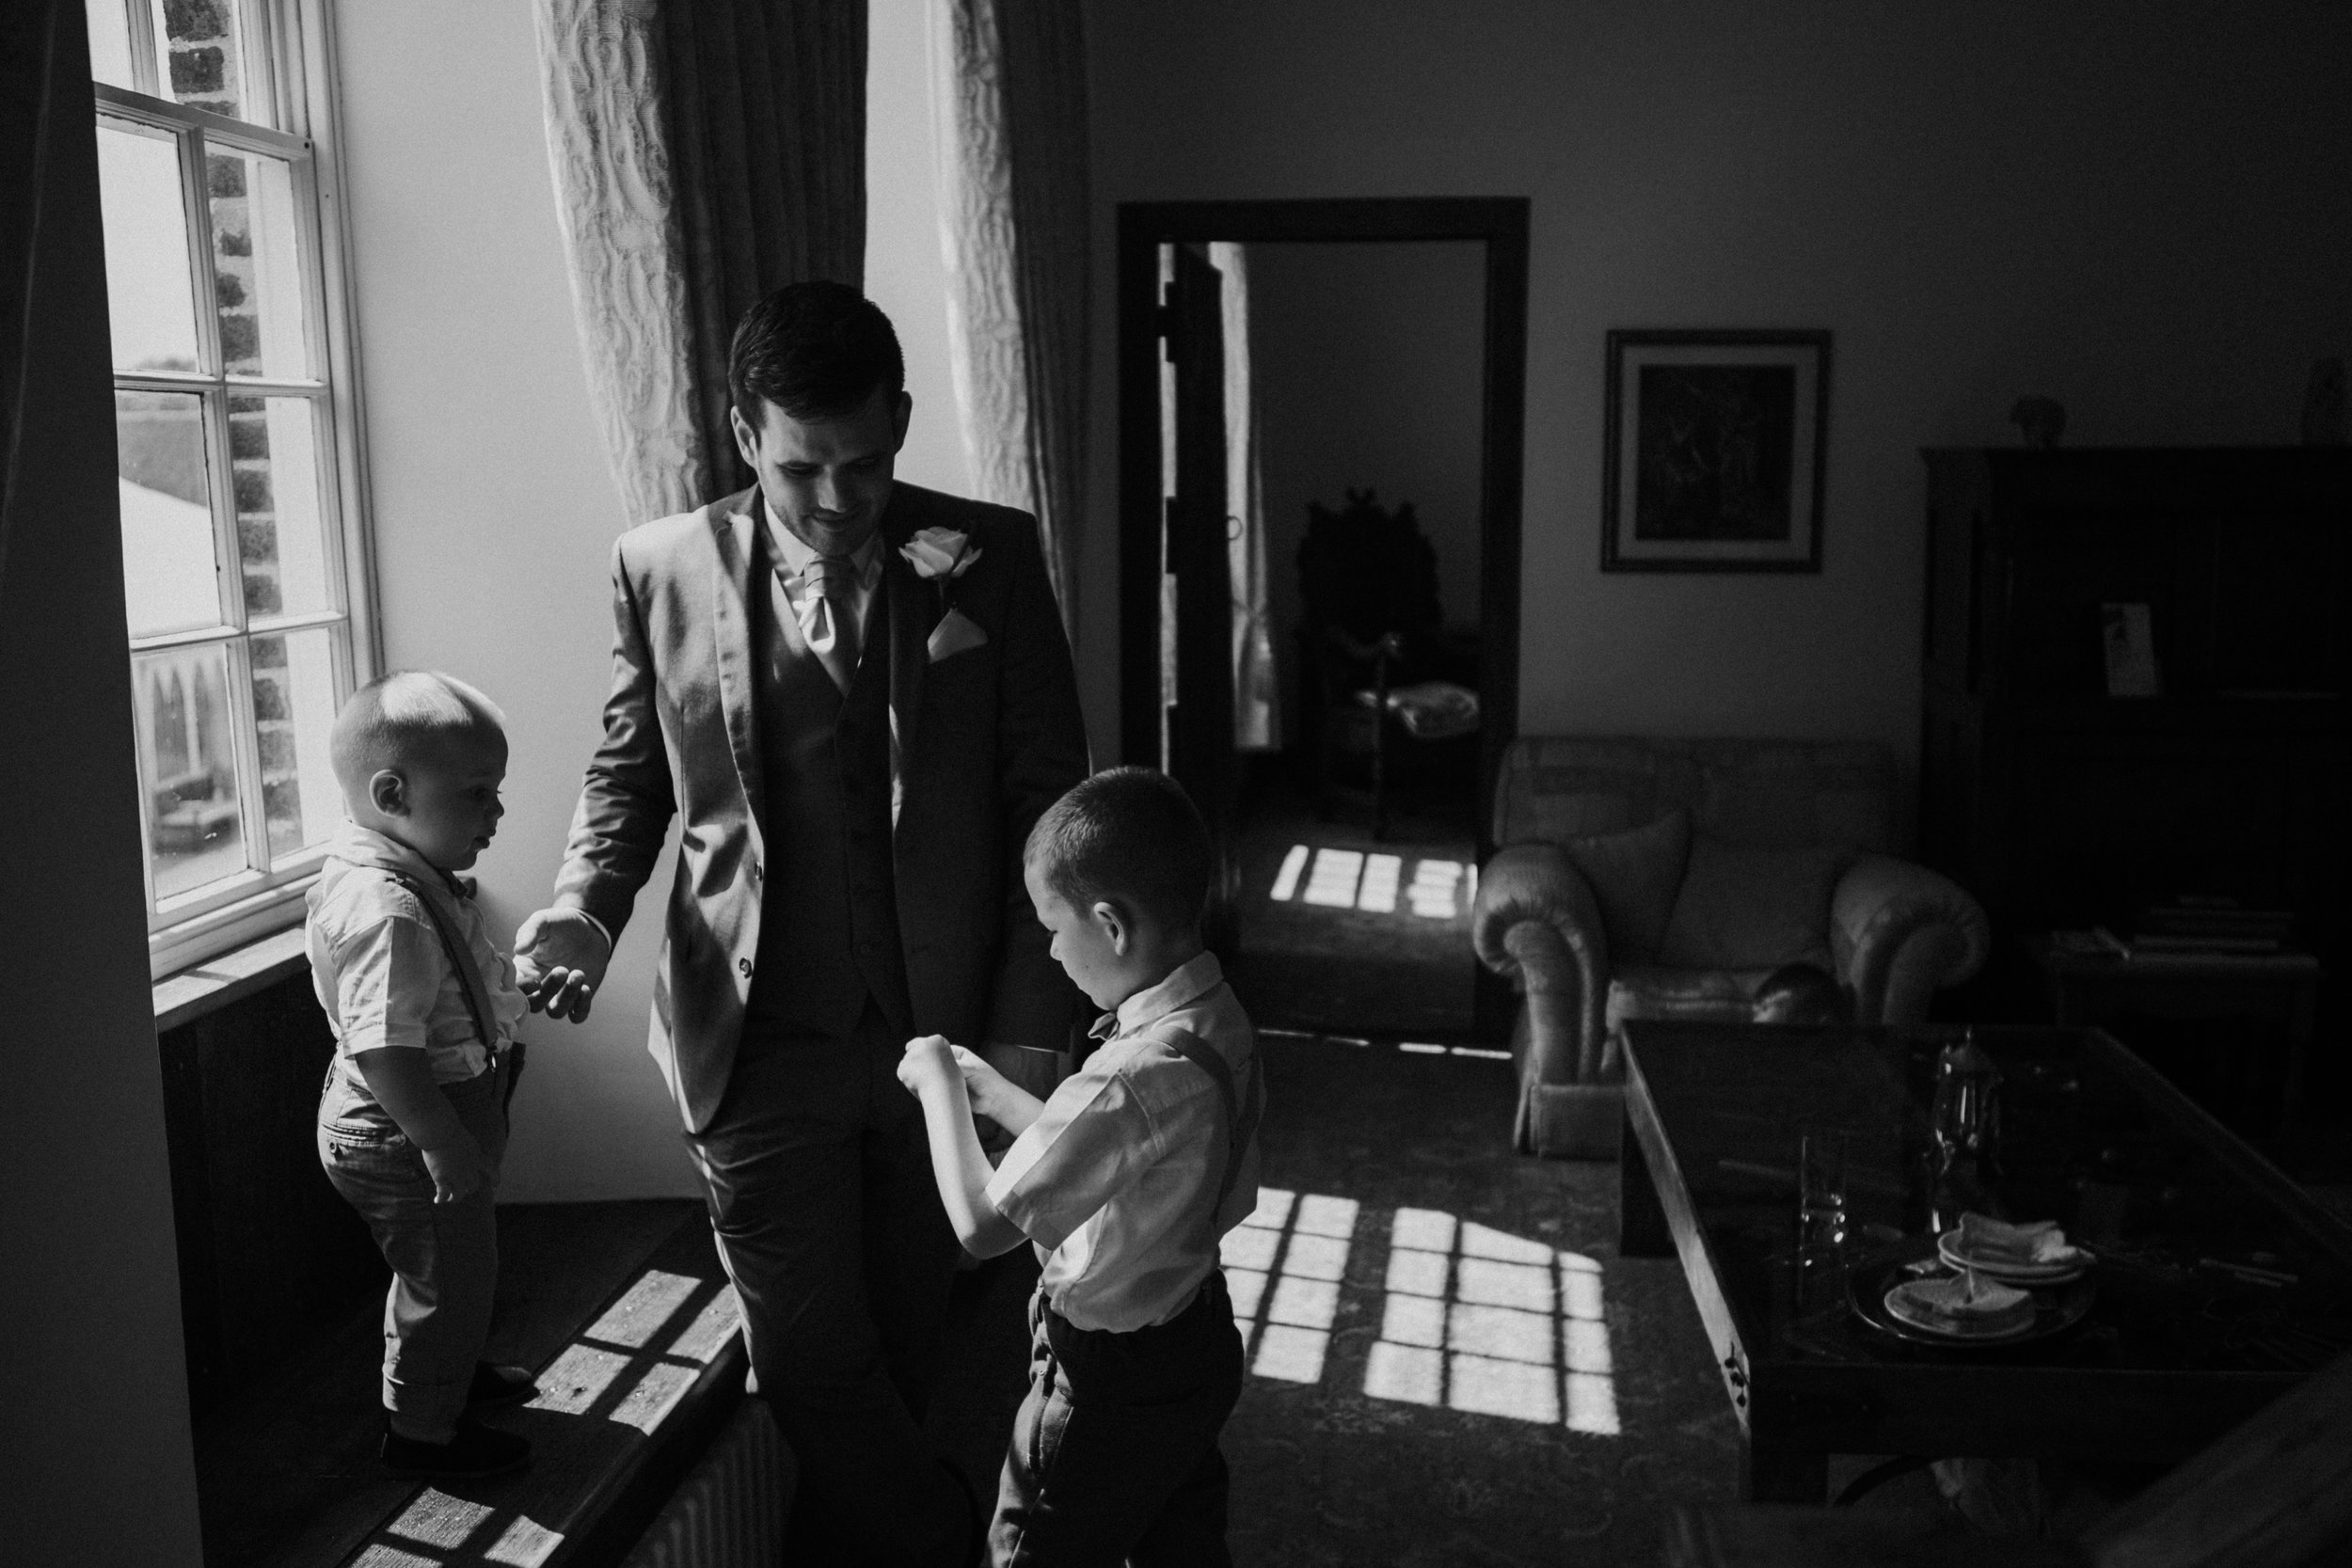 westenhangar-castle-kent-london-wedding-photography-bridal-prep-30